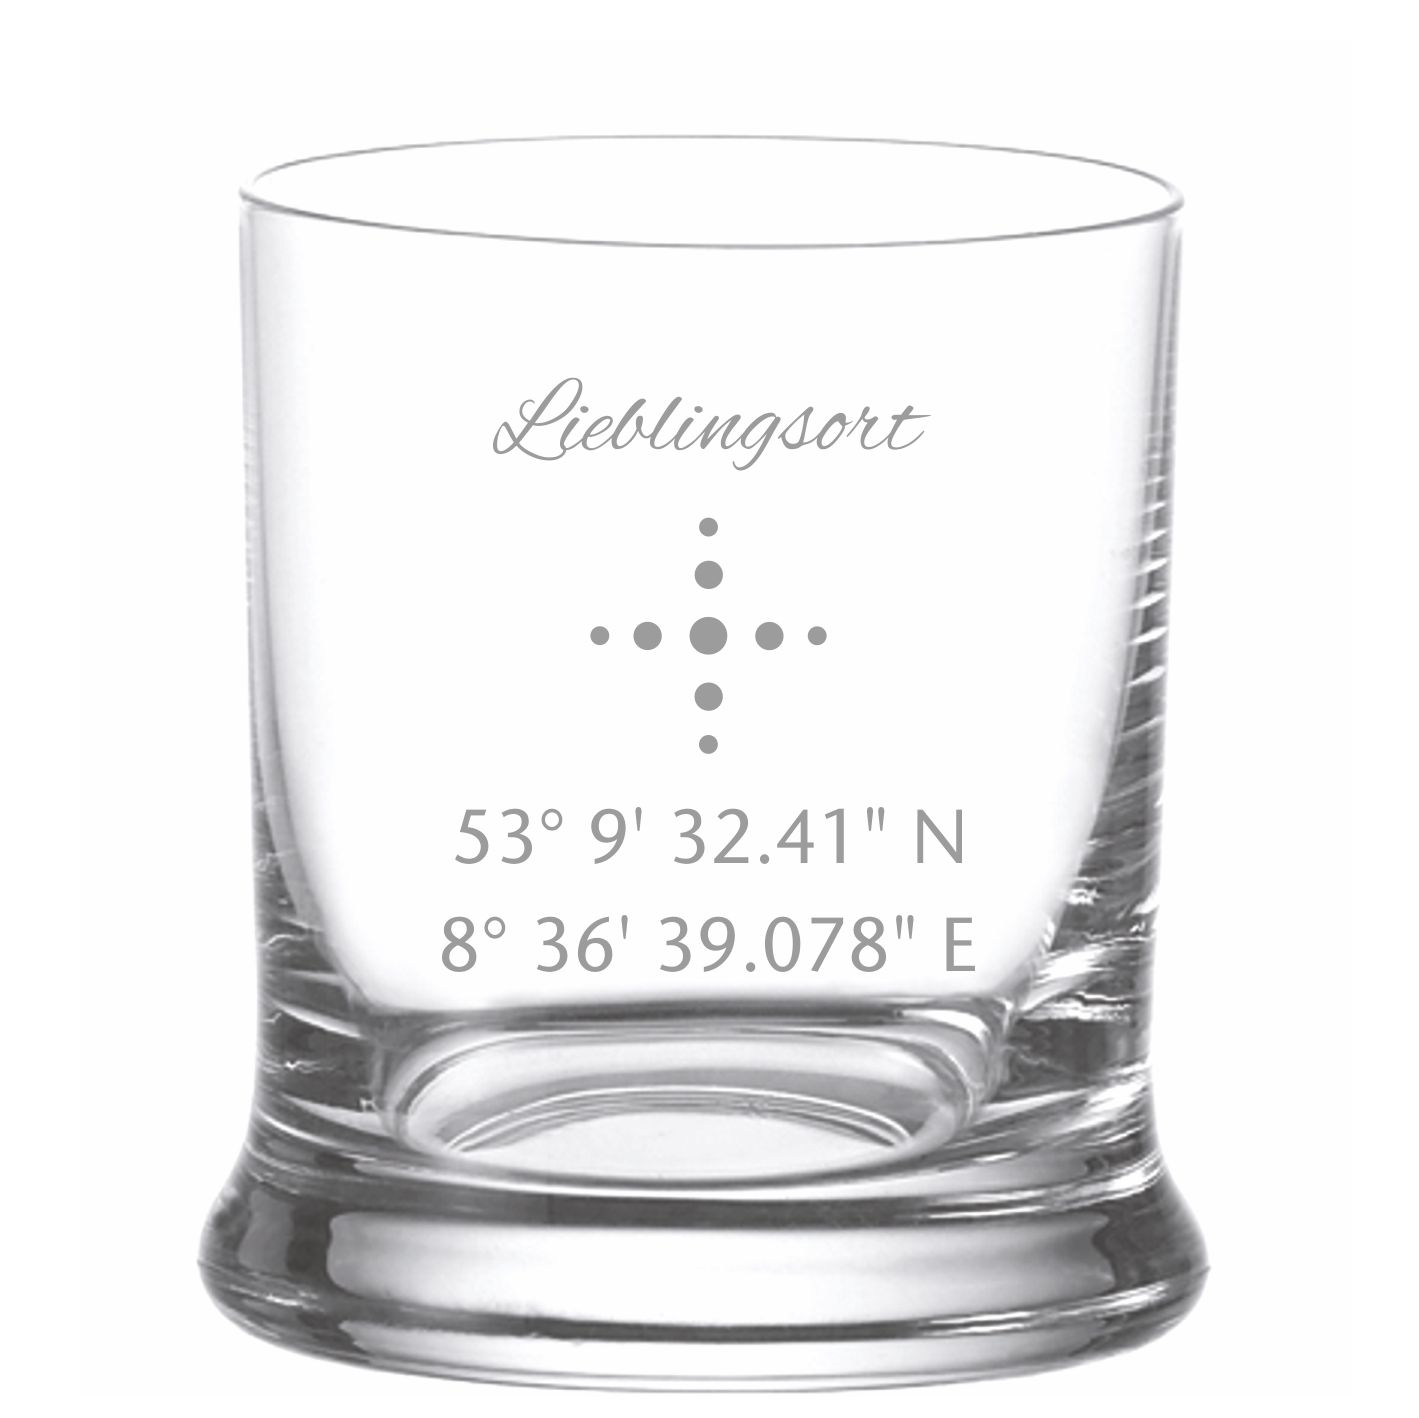 Leonardo Whiskyglas mit Gravur \